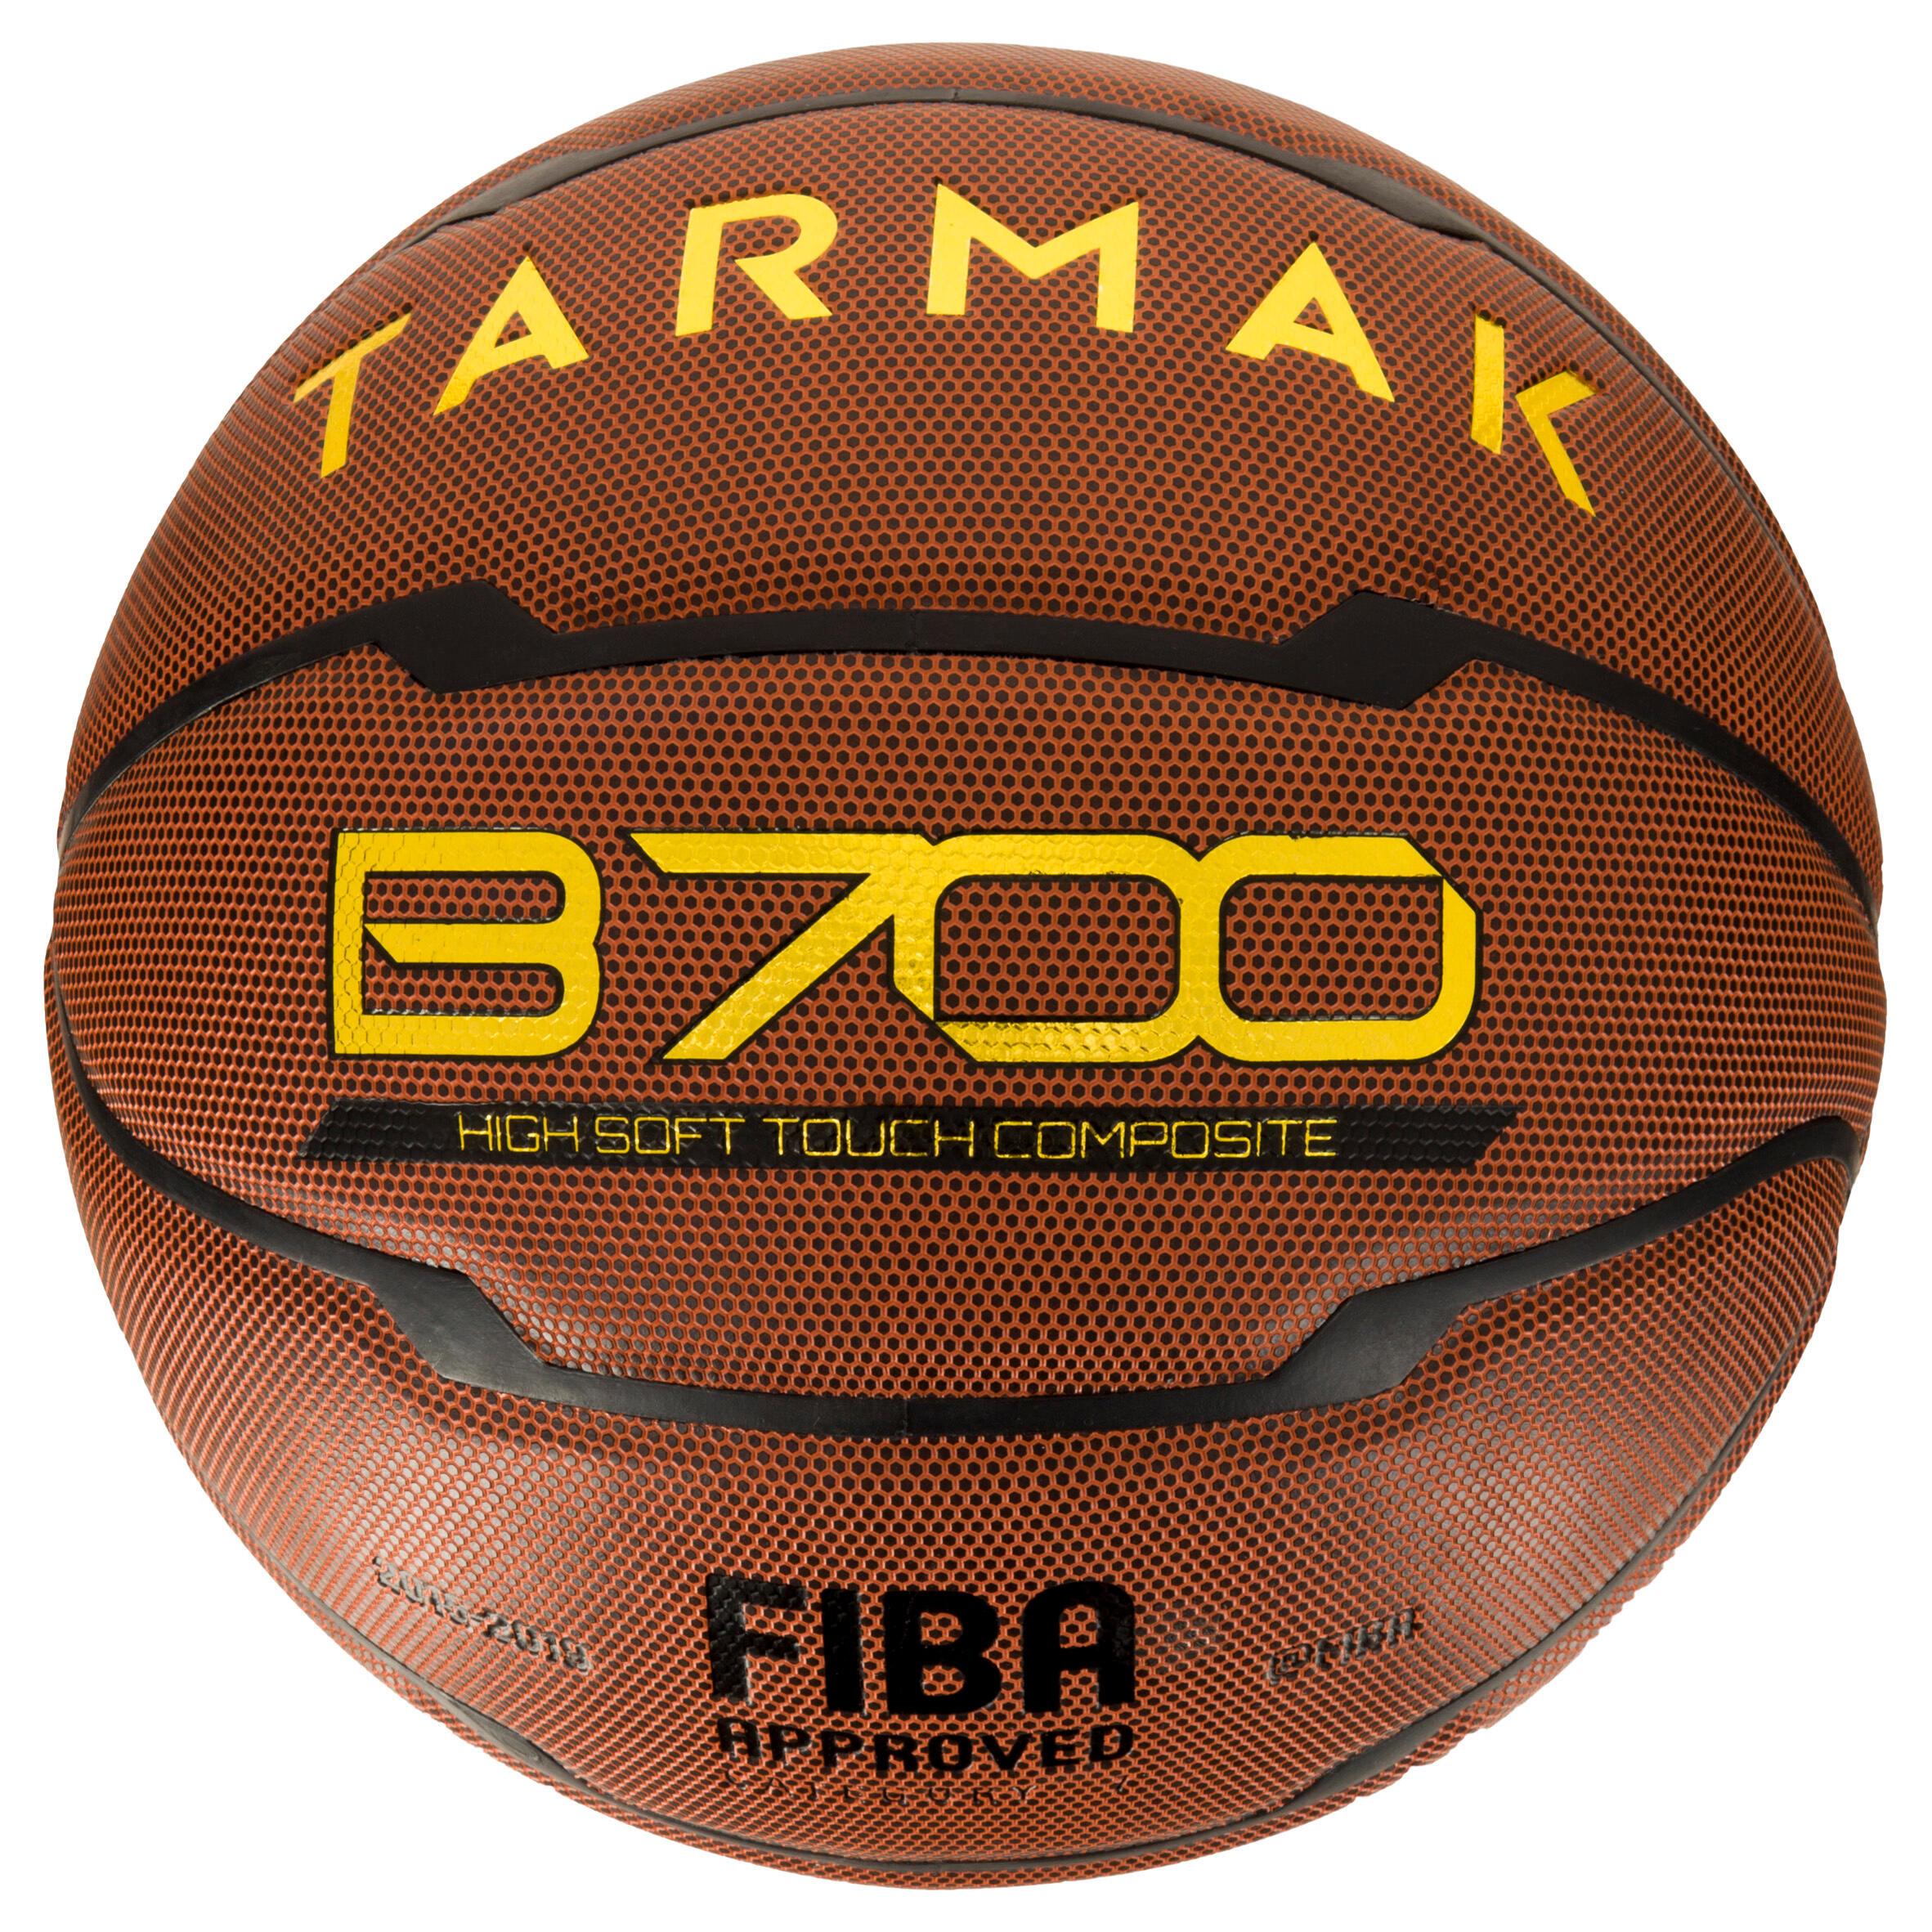 Tarmak Basketbal B700 maat 7 FIBA